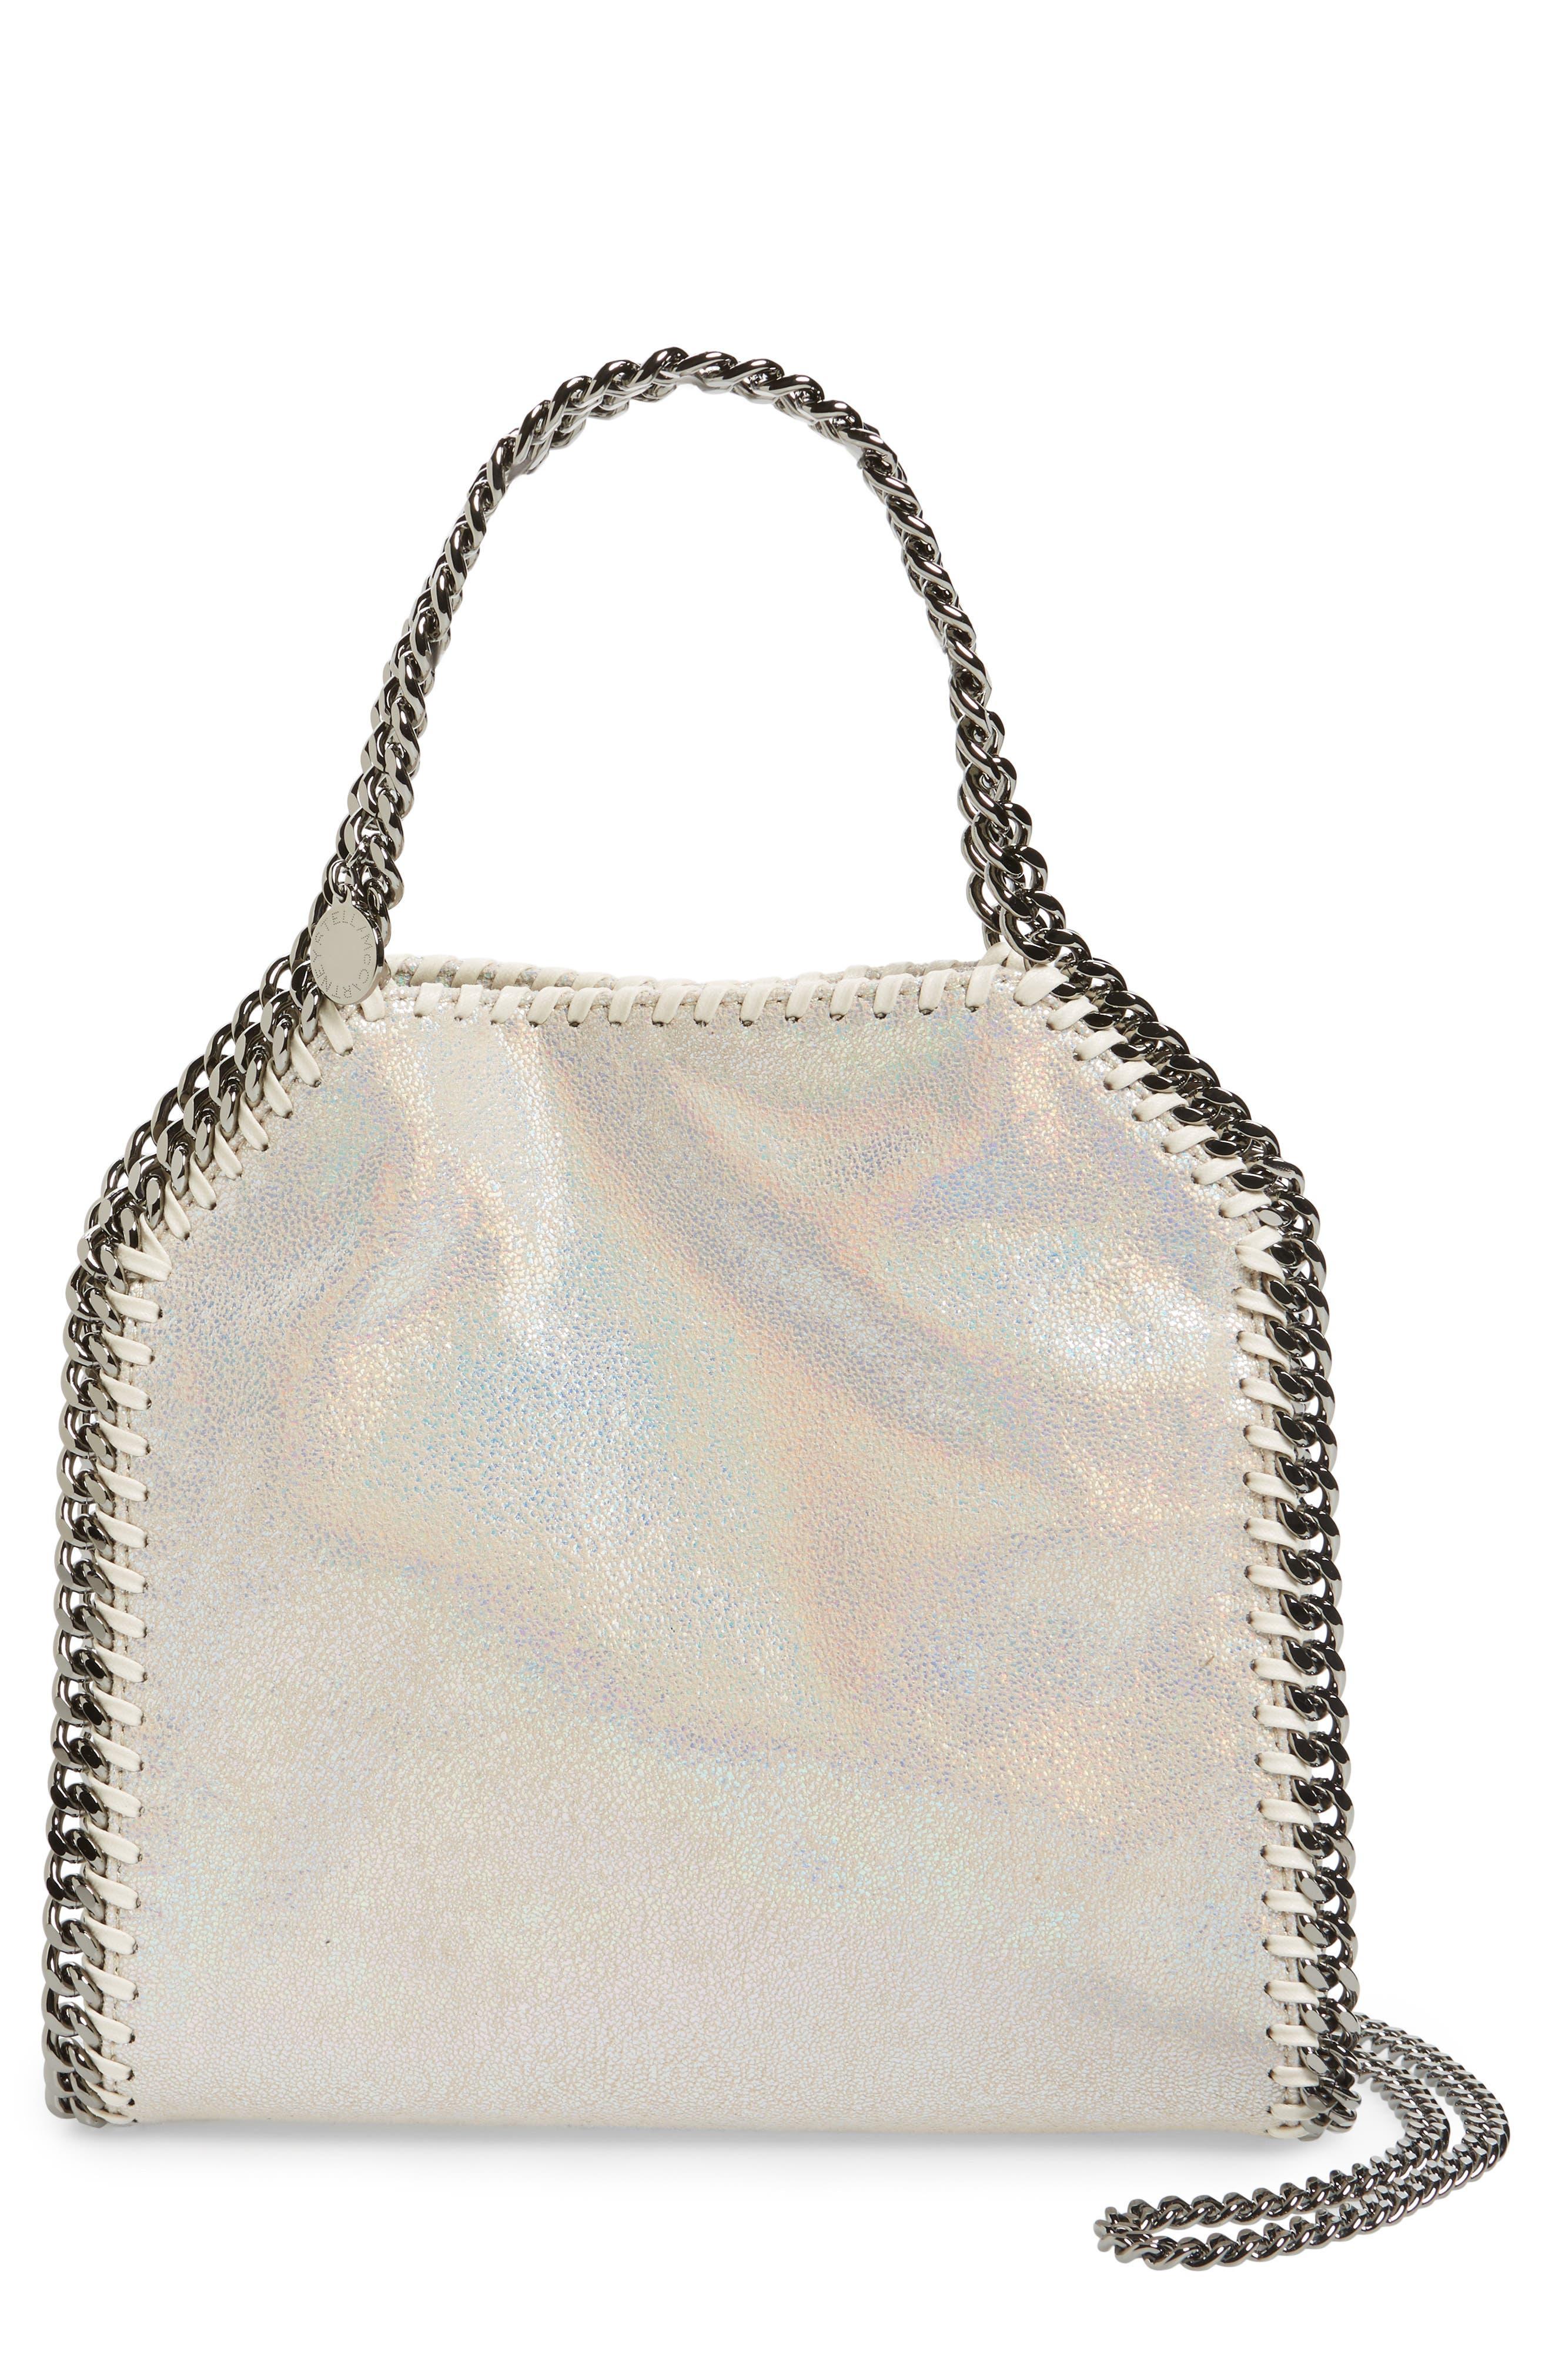 Main Image - Stella McCartney Mini Falabella - Holograph Faux Leather Crossbody Bag